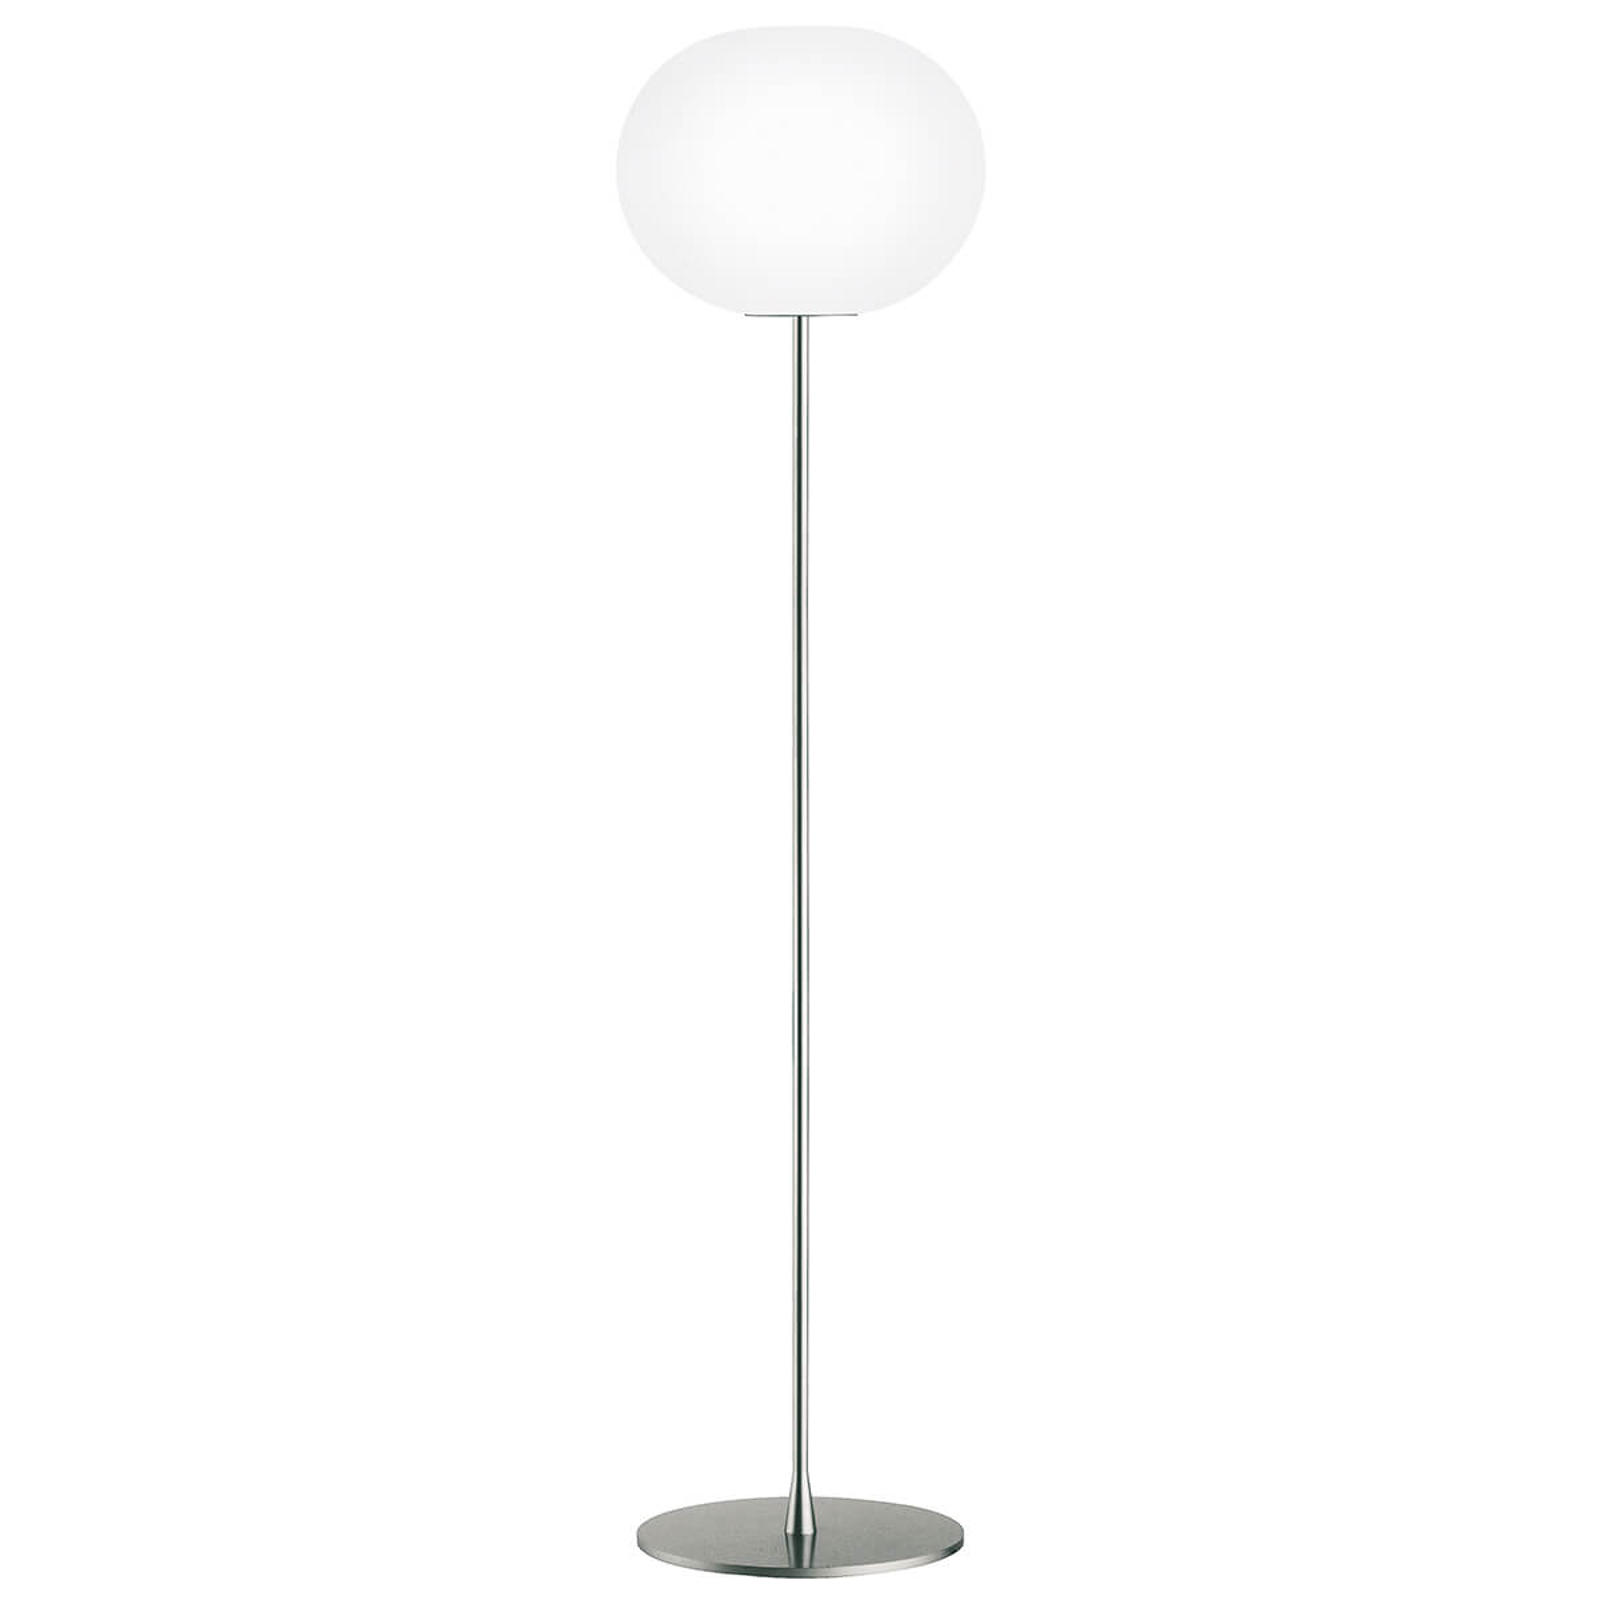 Stilren klassiker - golvlampan Glo-Ball F3